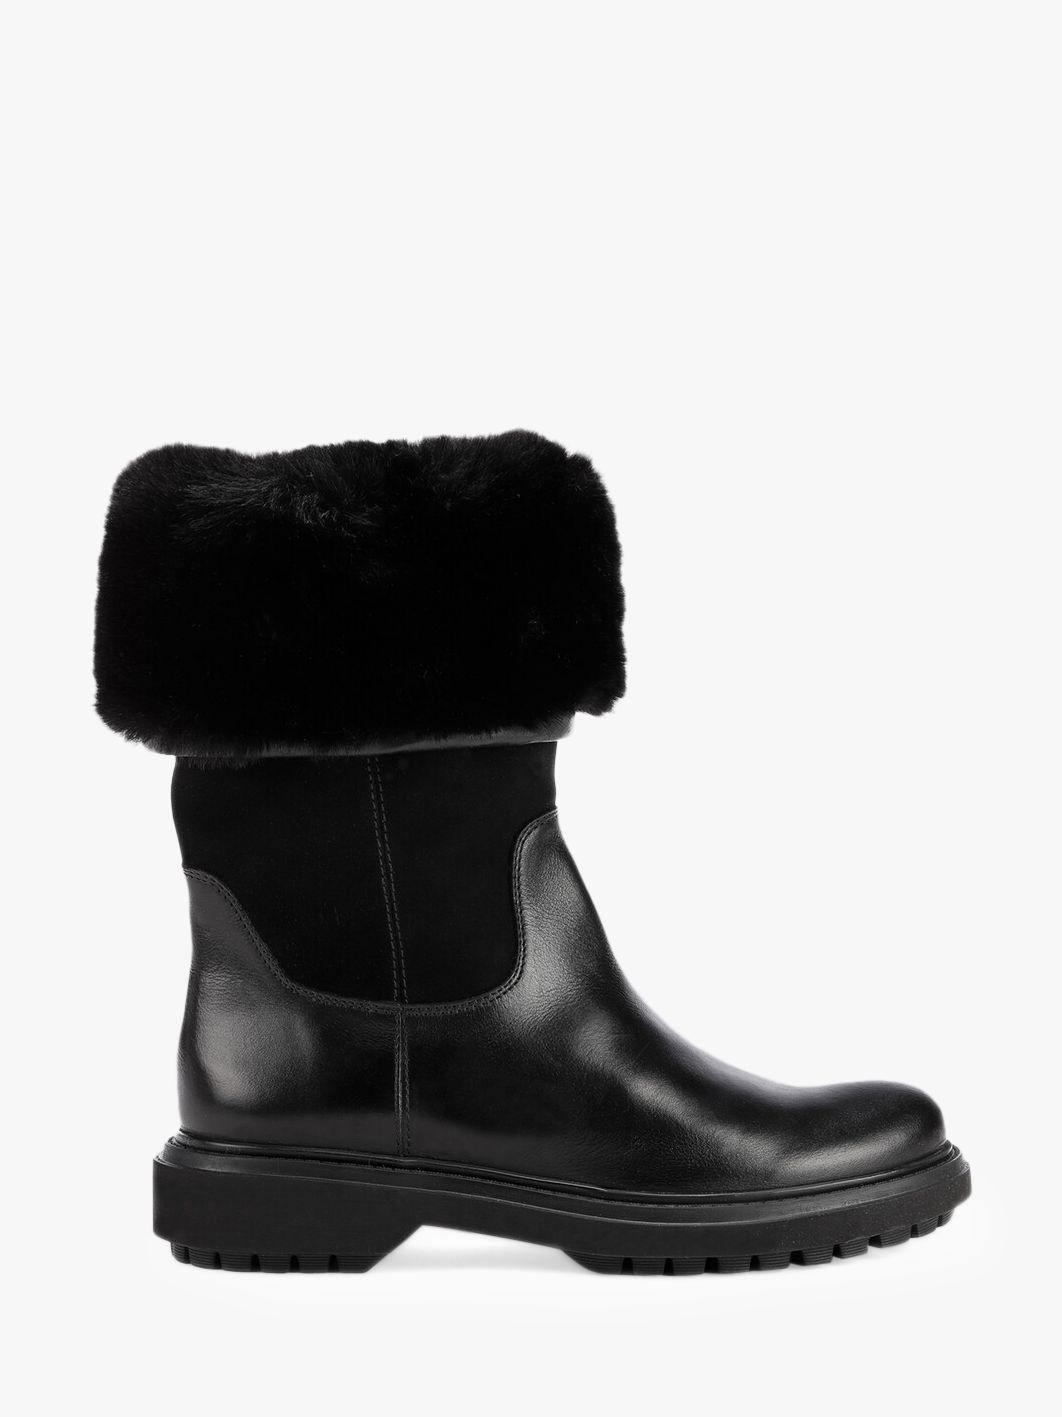 Geox Geox Women's Asheely Fur Calf Boots, Black